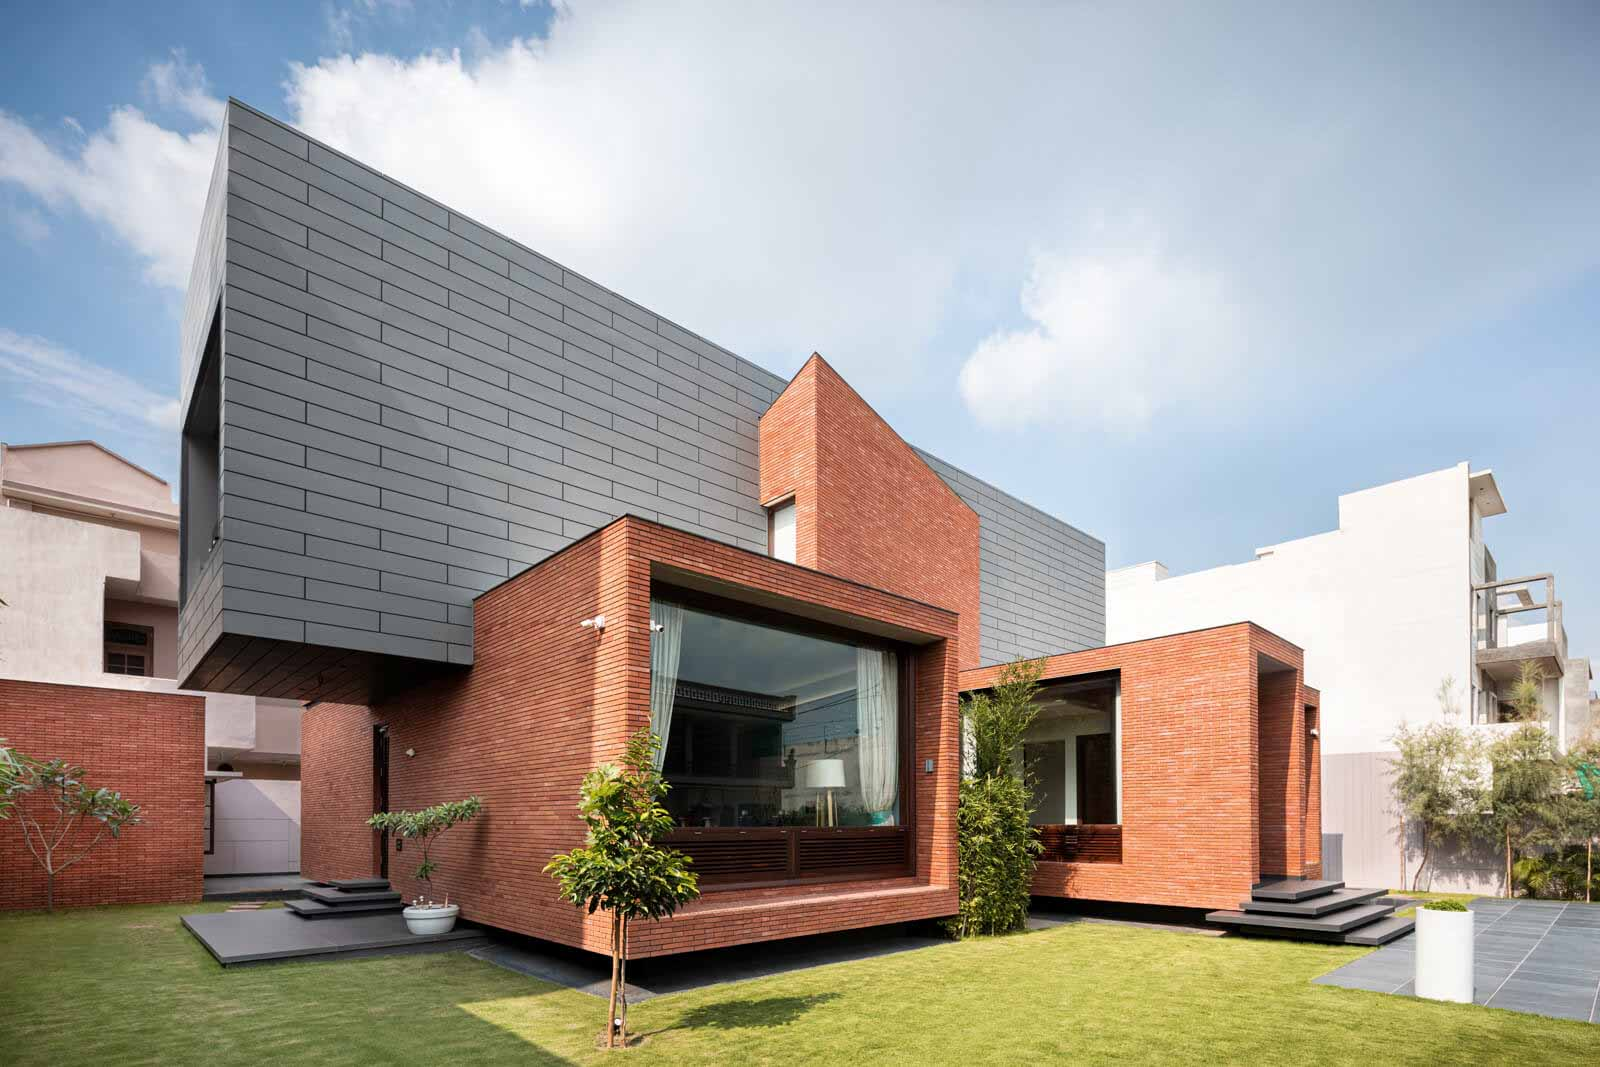 Sidhu Residence / Anudeep Bhandari & Associates